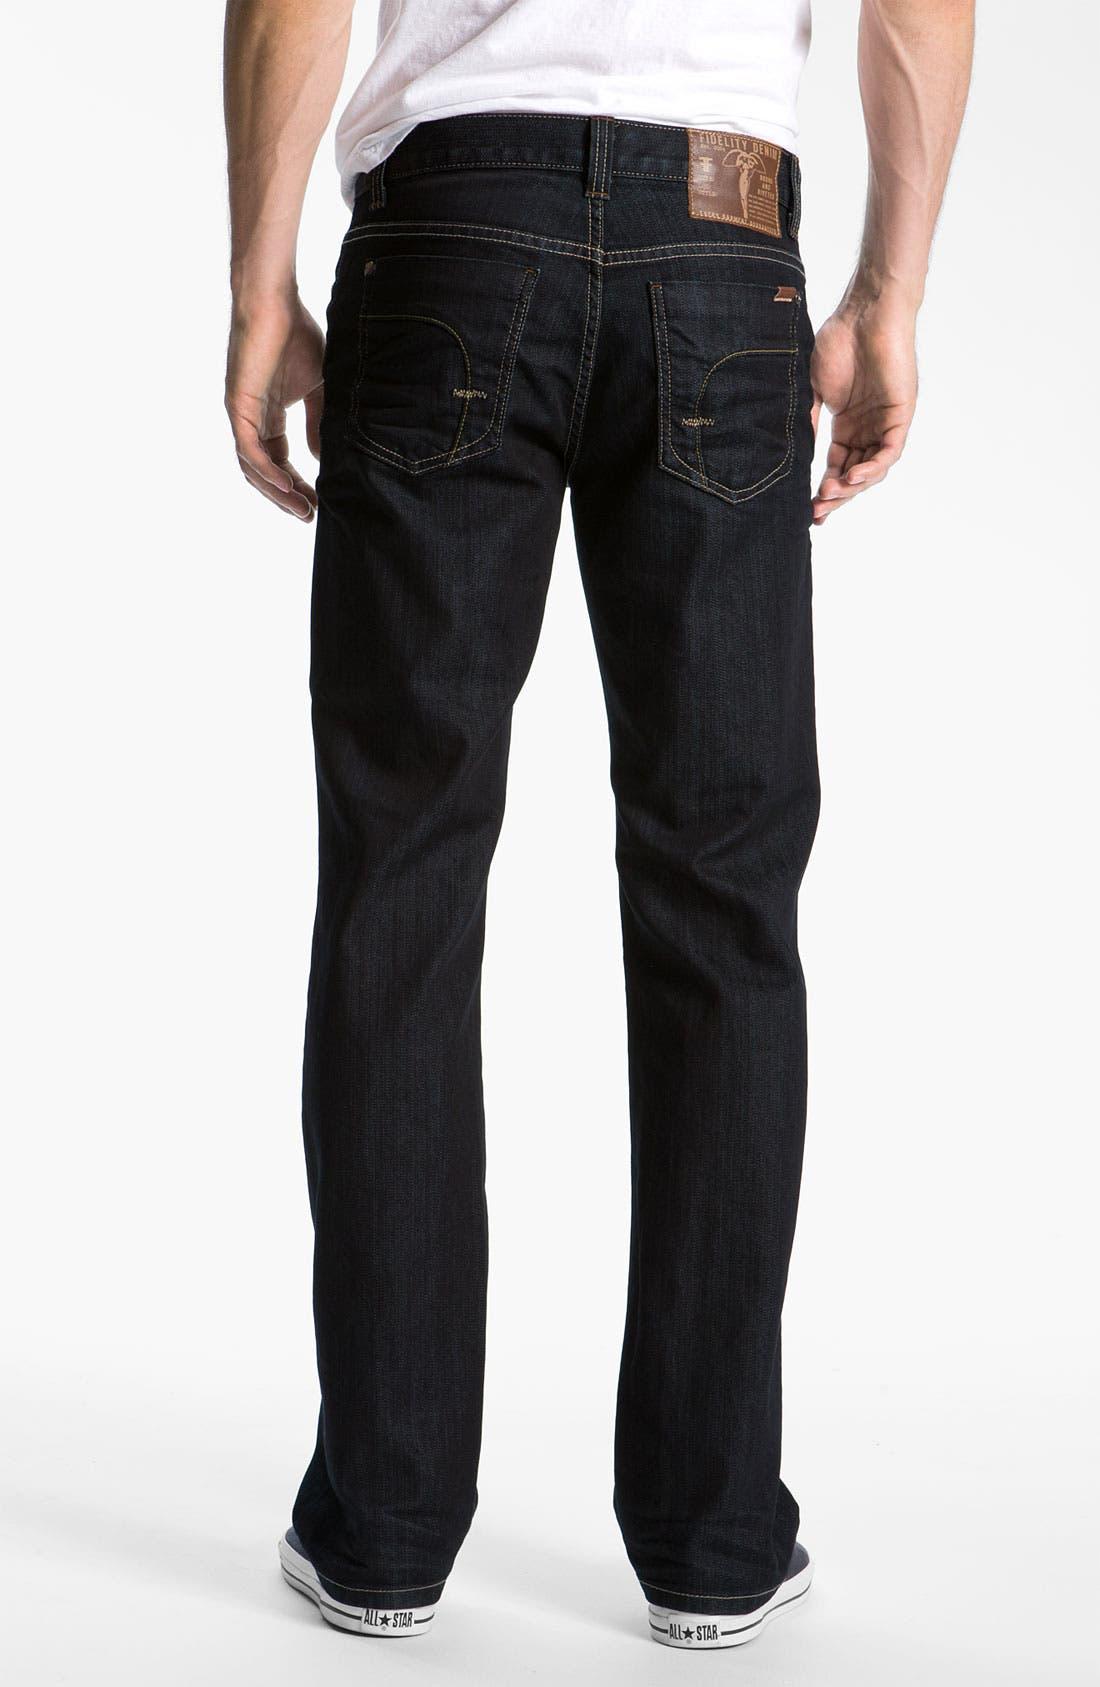 '50-11' Straight Leg Jeans,                             Alternate thumbnail 2, color,